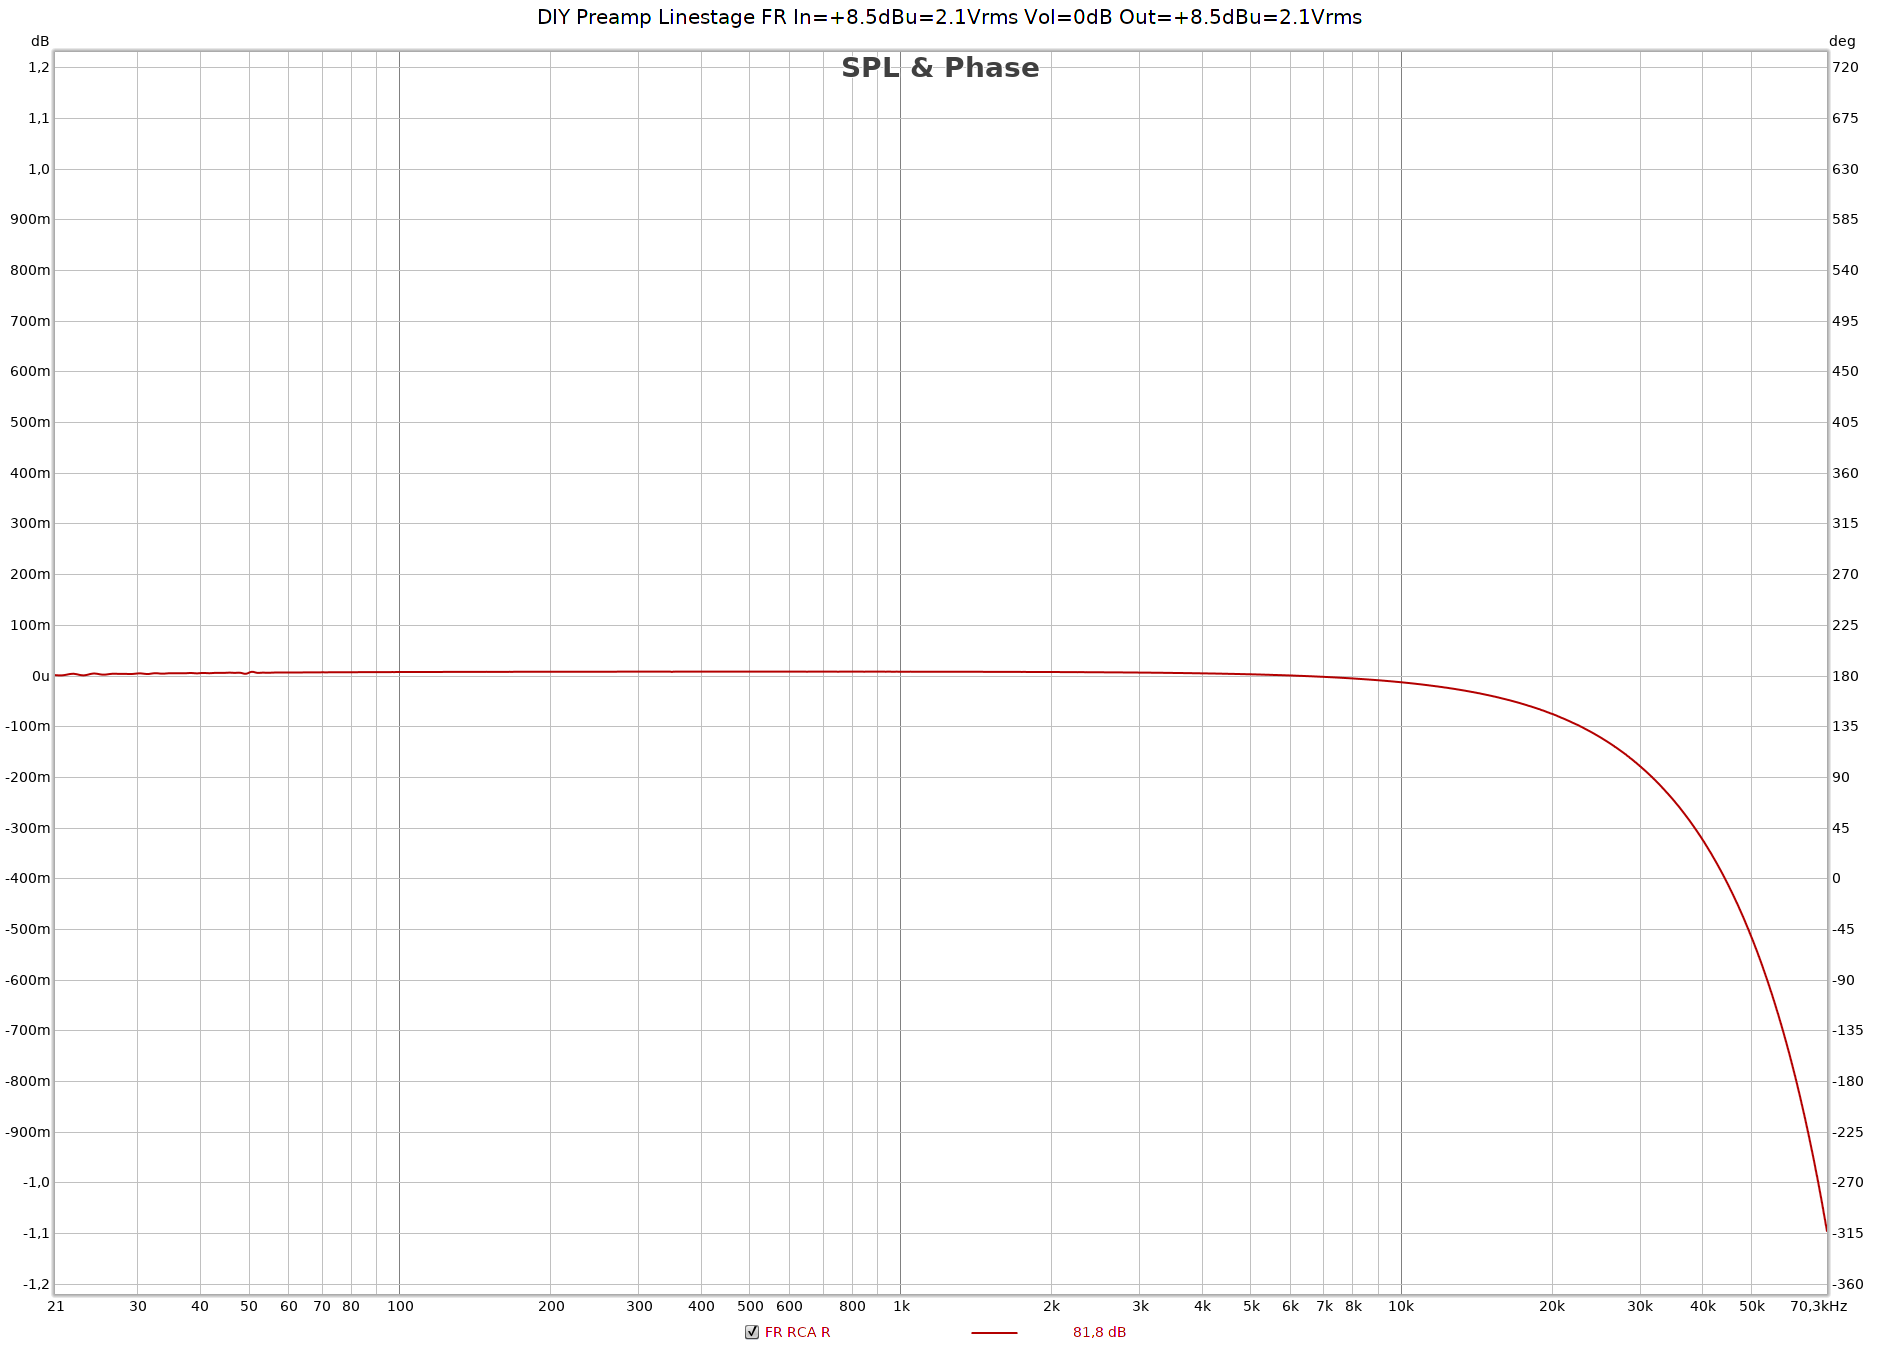 DIY Preamp Linestage FR In=+8.5dBu=2.1Vrms Vol=0dB Out=+8.5dBu=2.1Vrms.png